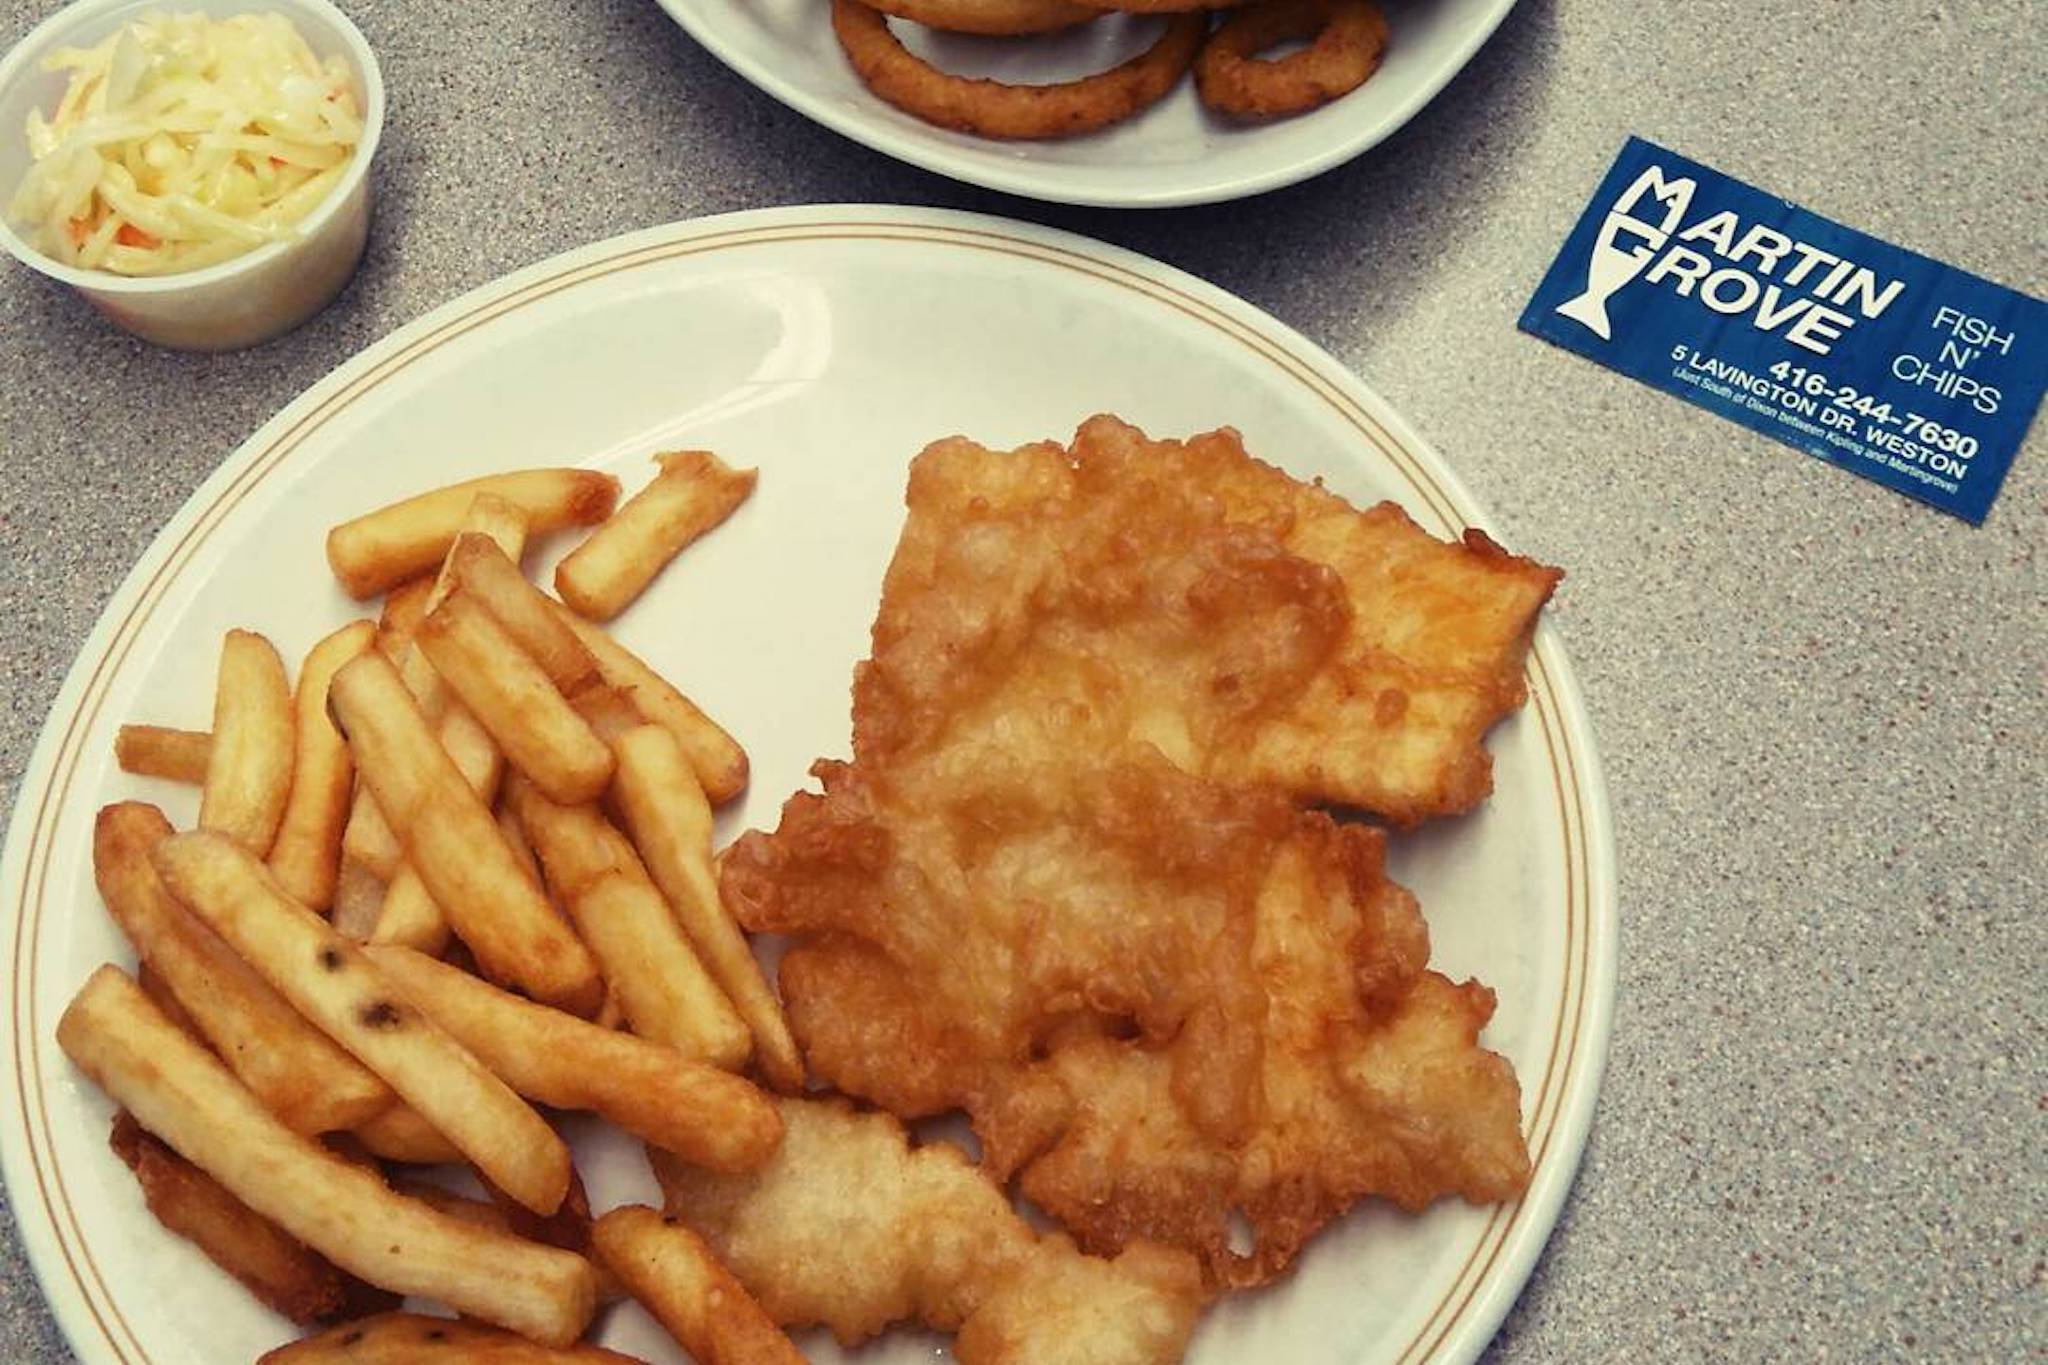 Martin Grove Fish and Chips Toronto